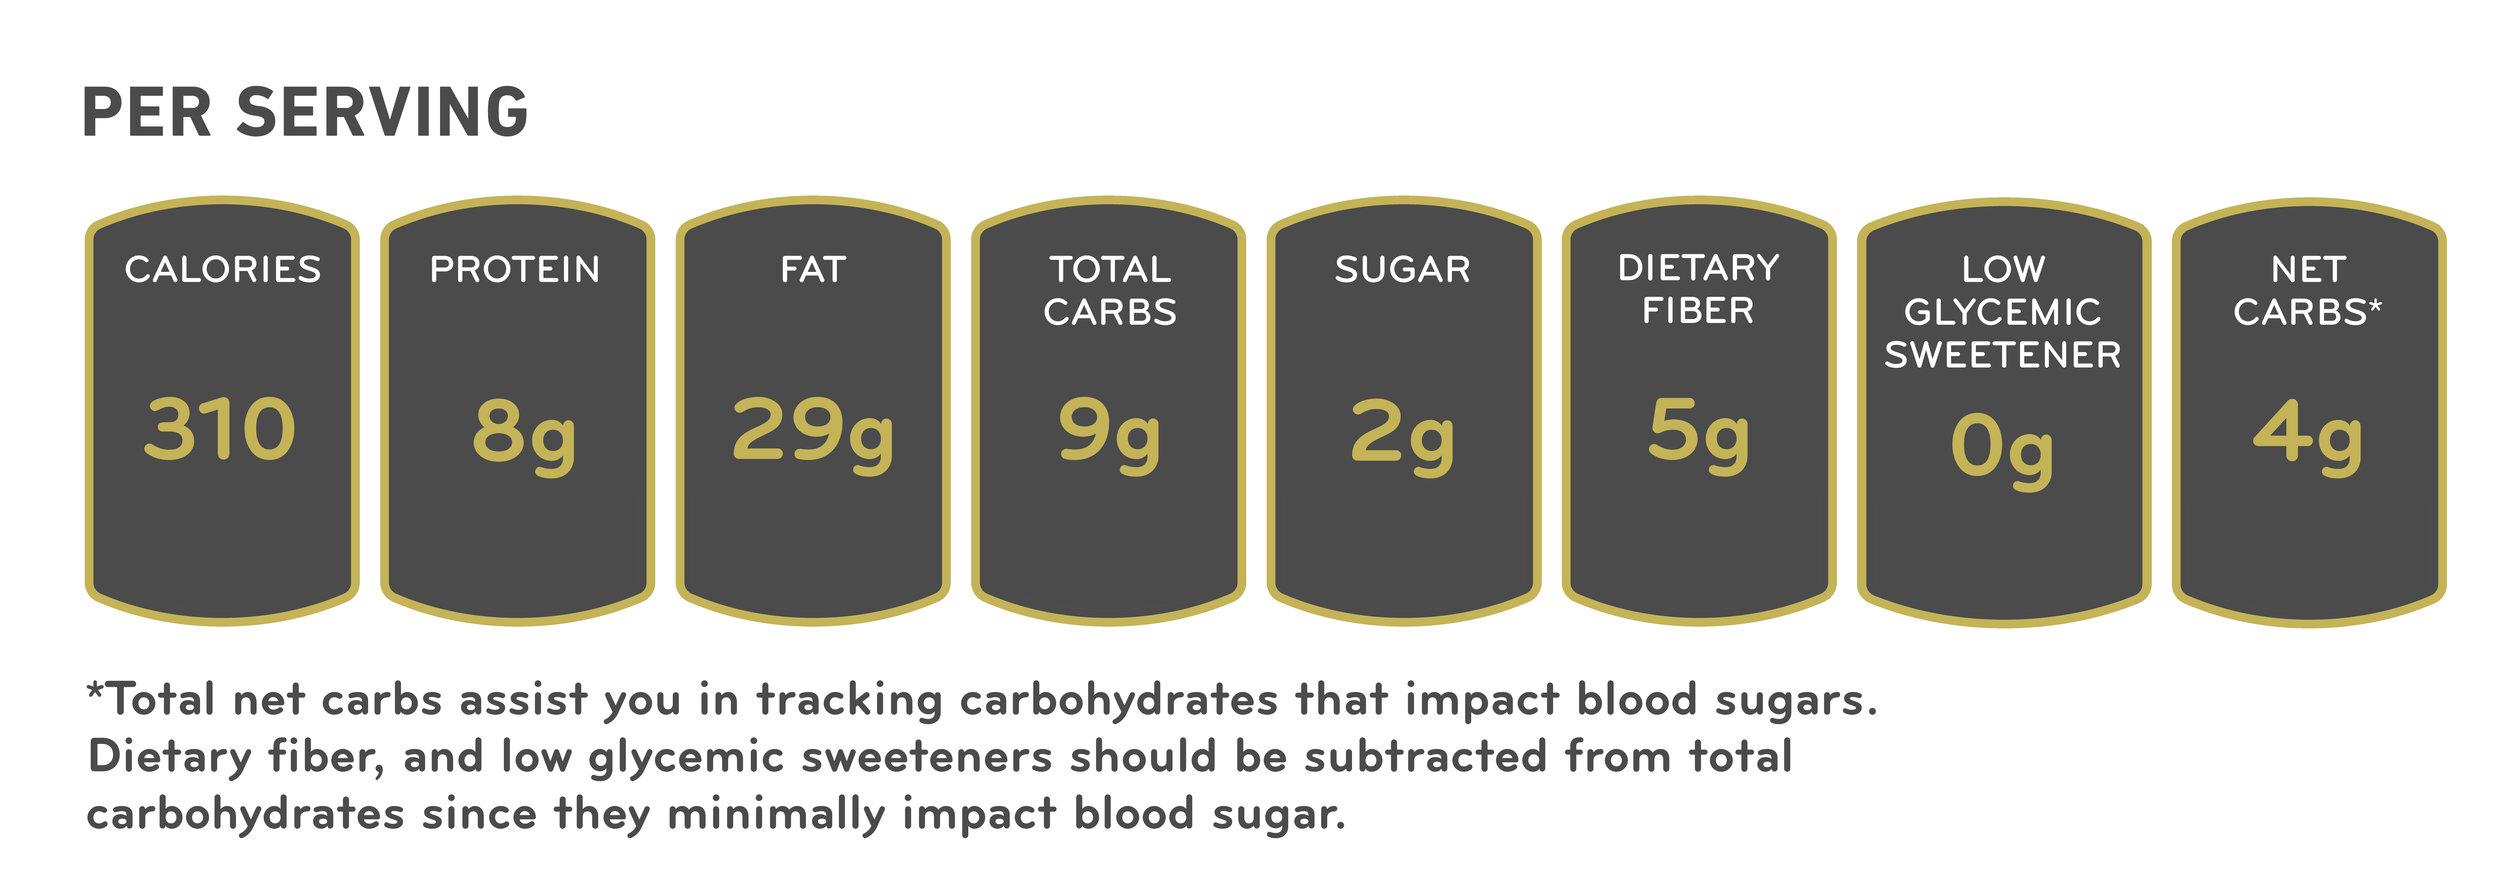 BAKED STUFFED AVOCADO NUTRITION FACTS.jpg